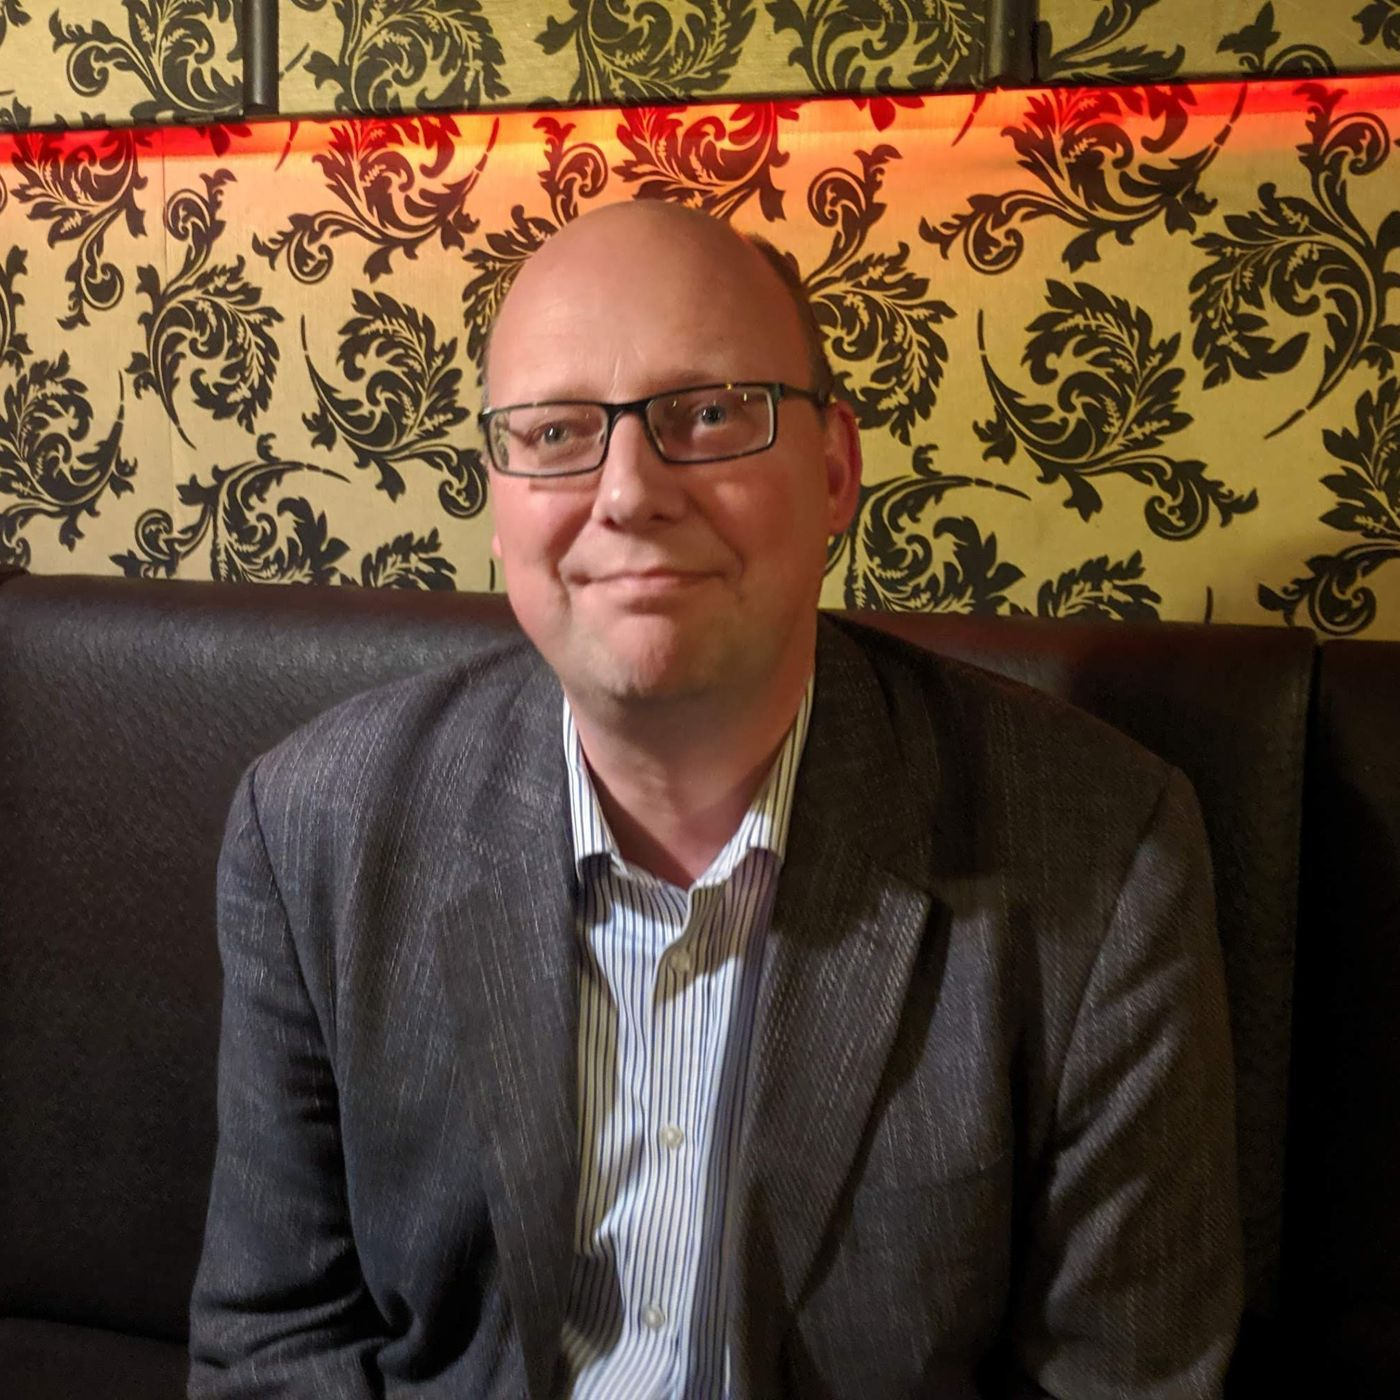 Dr Karl Löfgren - Computer says no